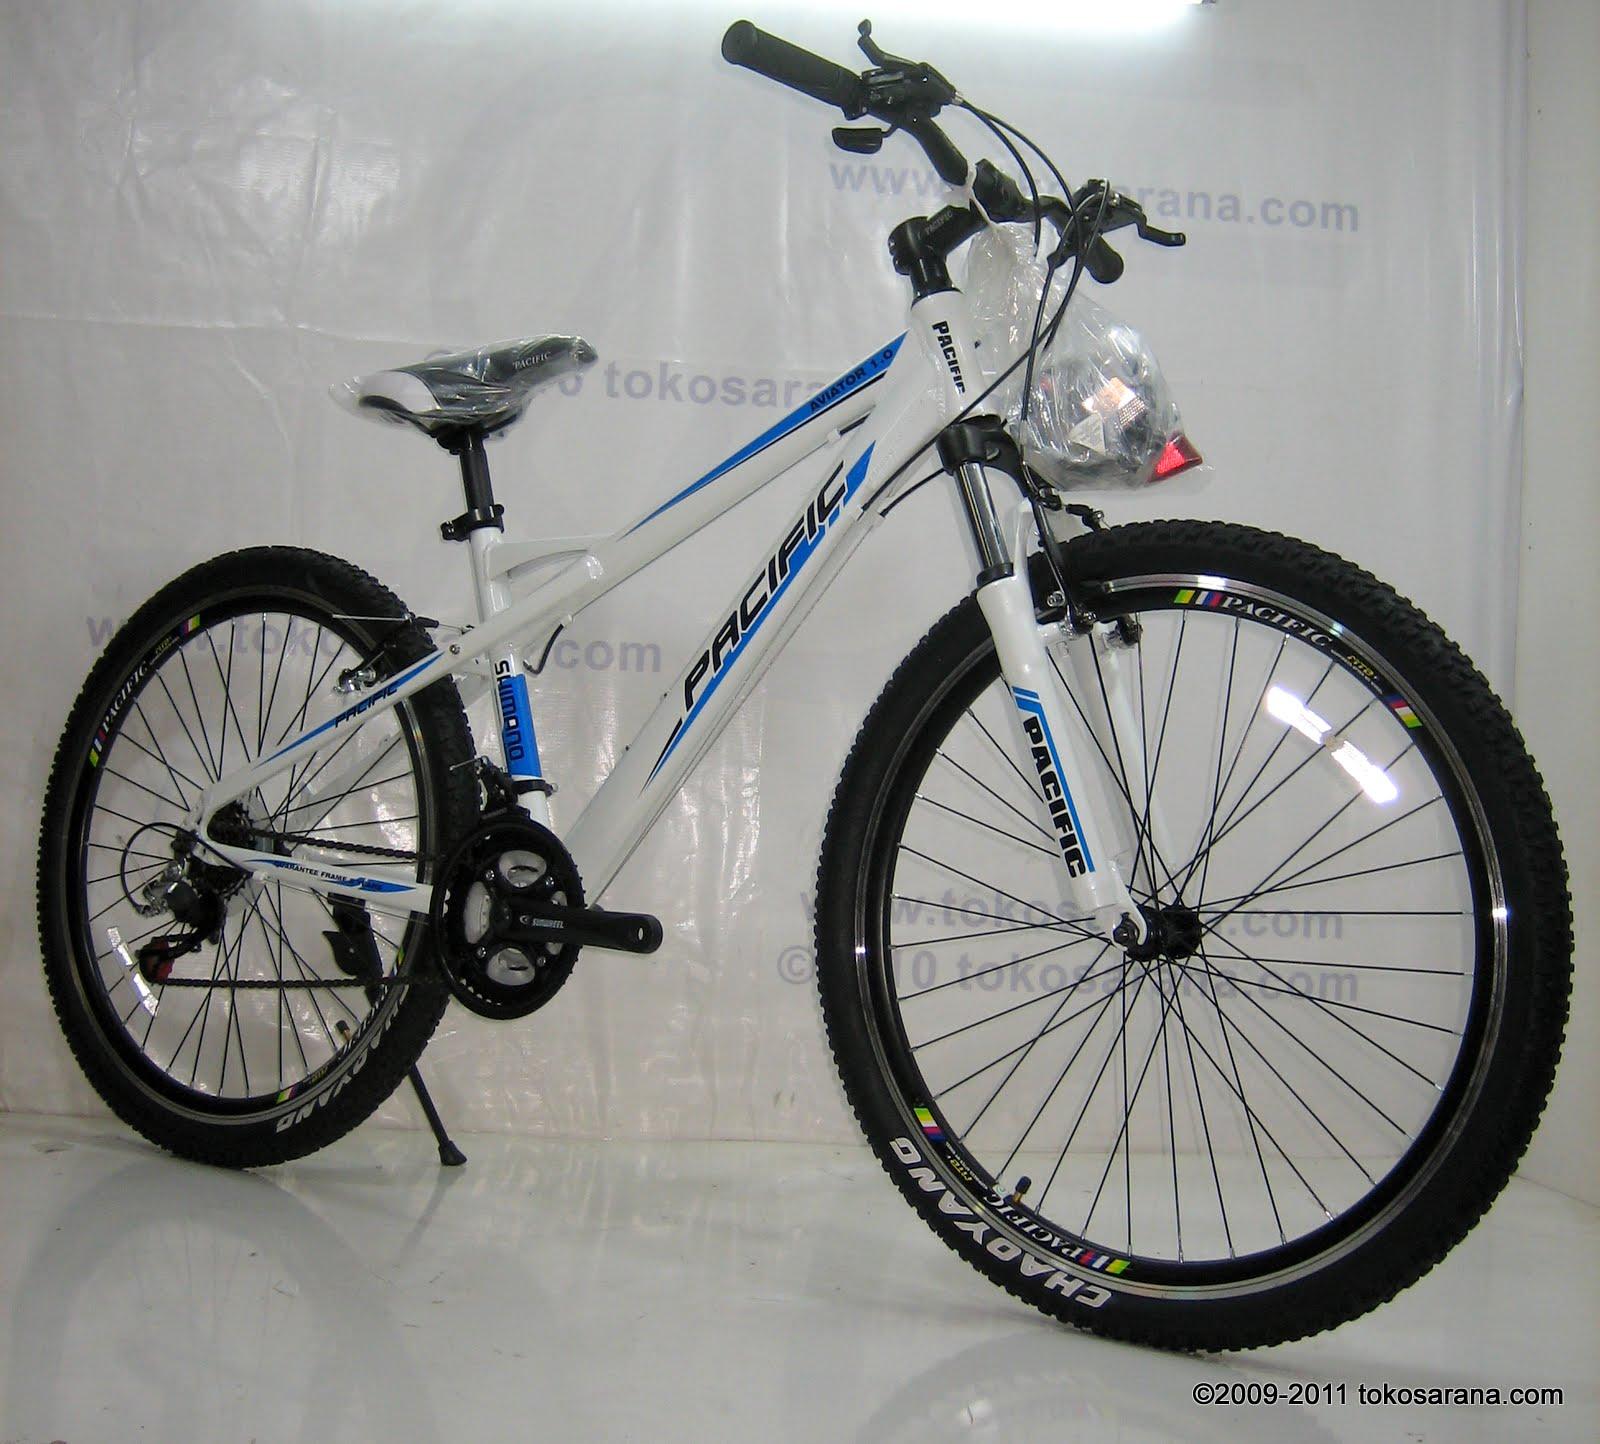 tokomagenta: A Showcase of Products: Sepeda Gunung Pacific